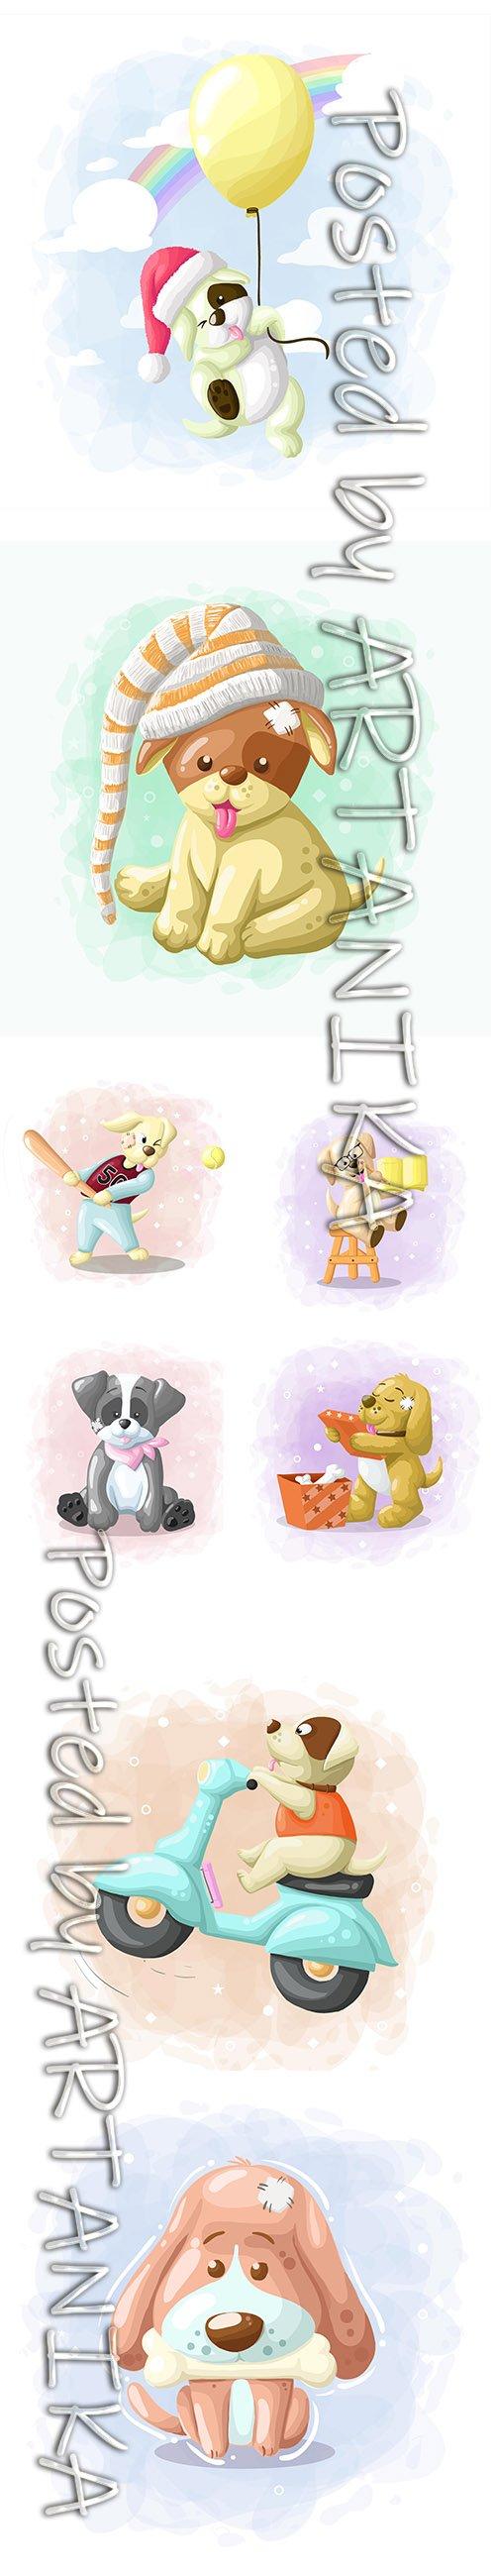 Cute Little Animals Cartoon Illustrations Vol 2